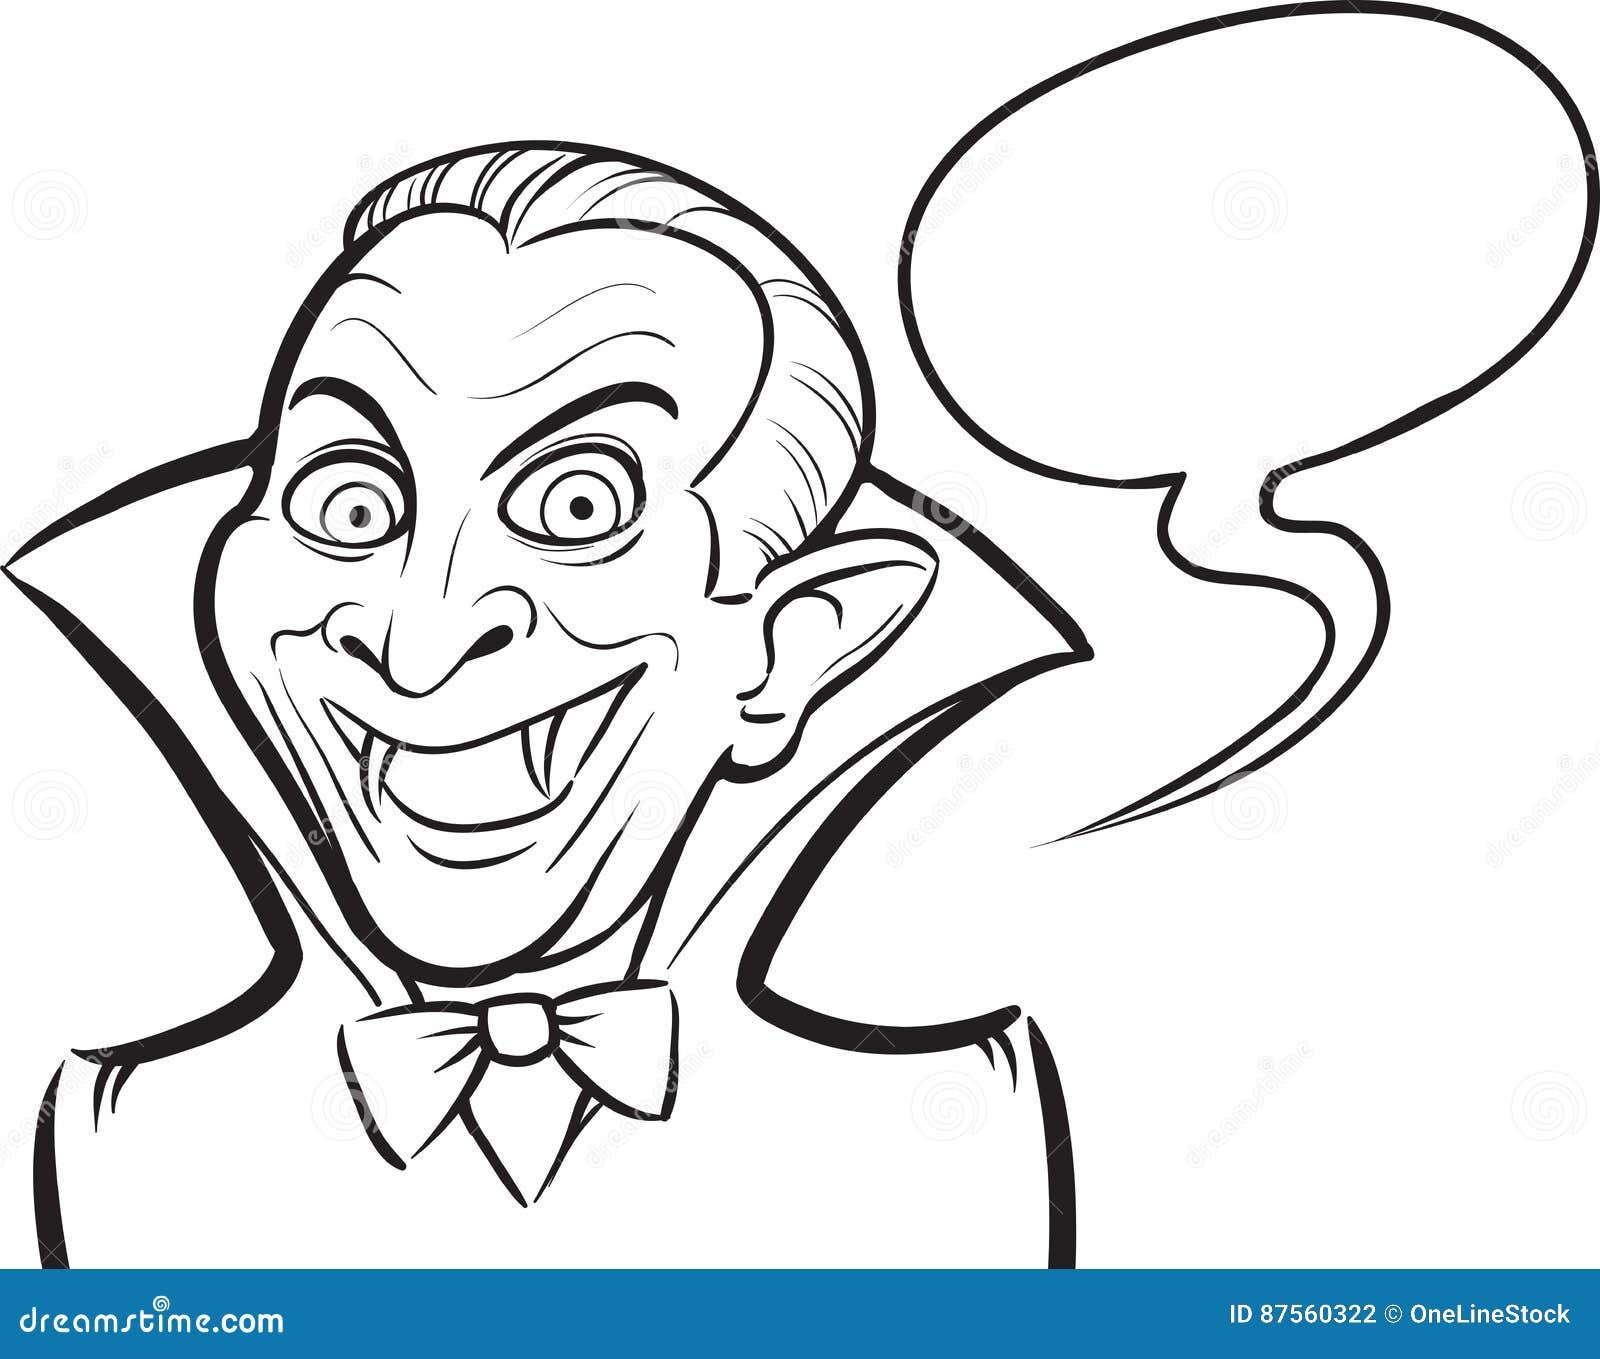 whiteboard drawing vampire halloween cartoon character stock